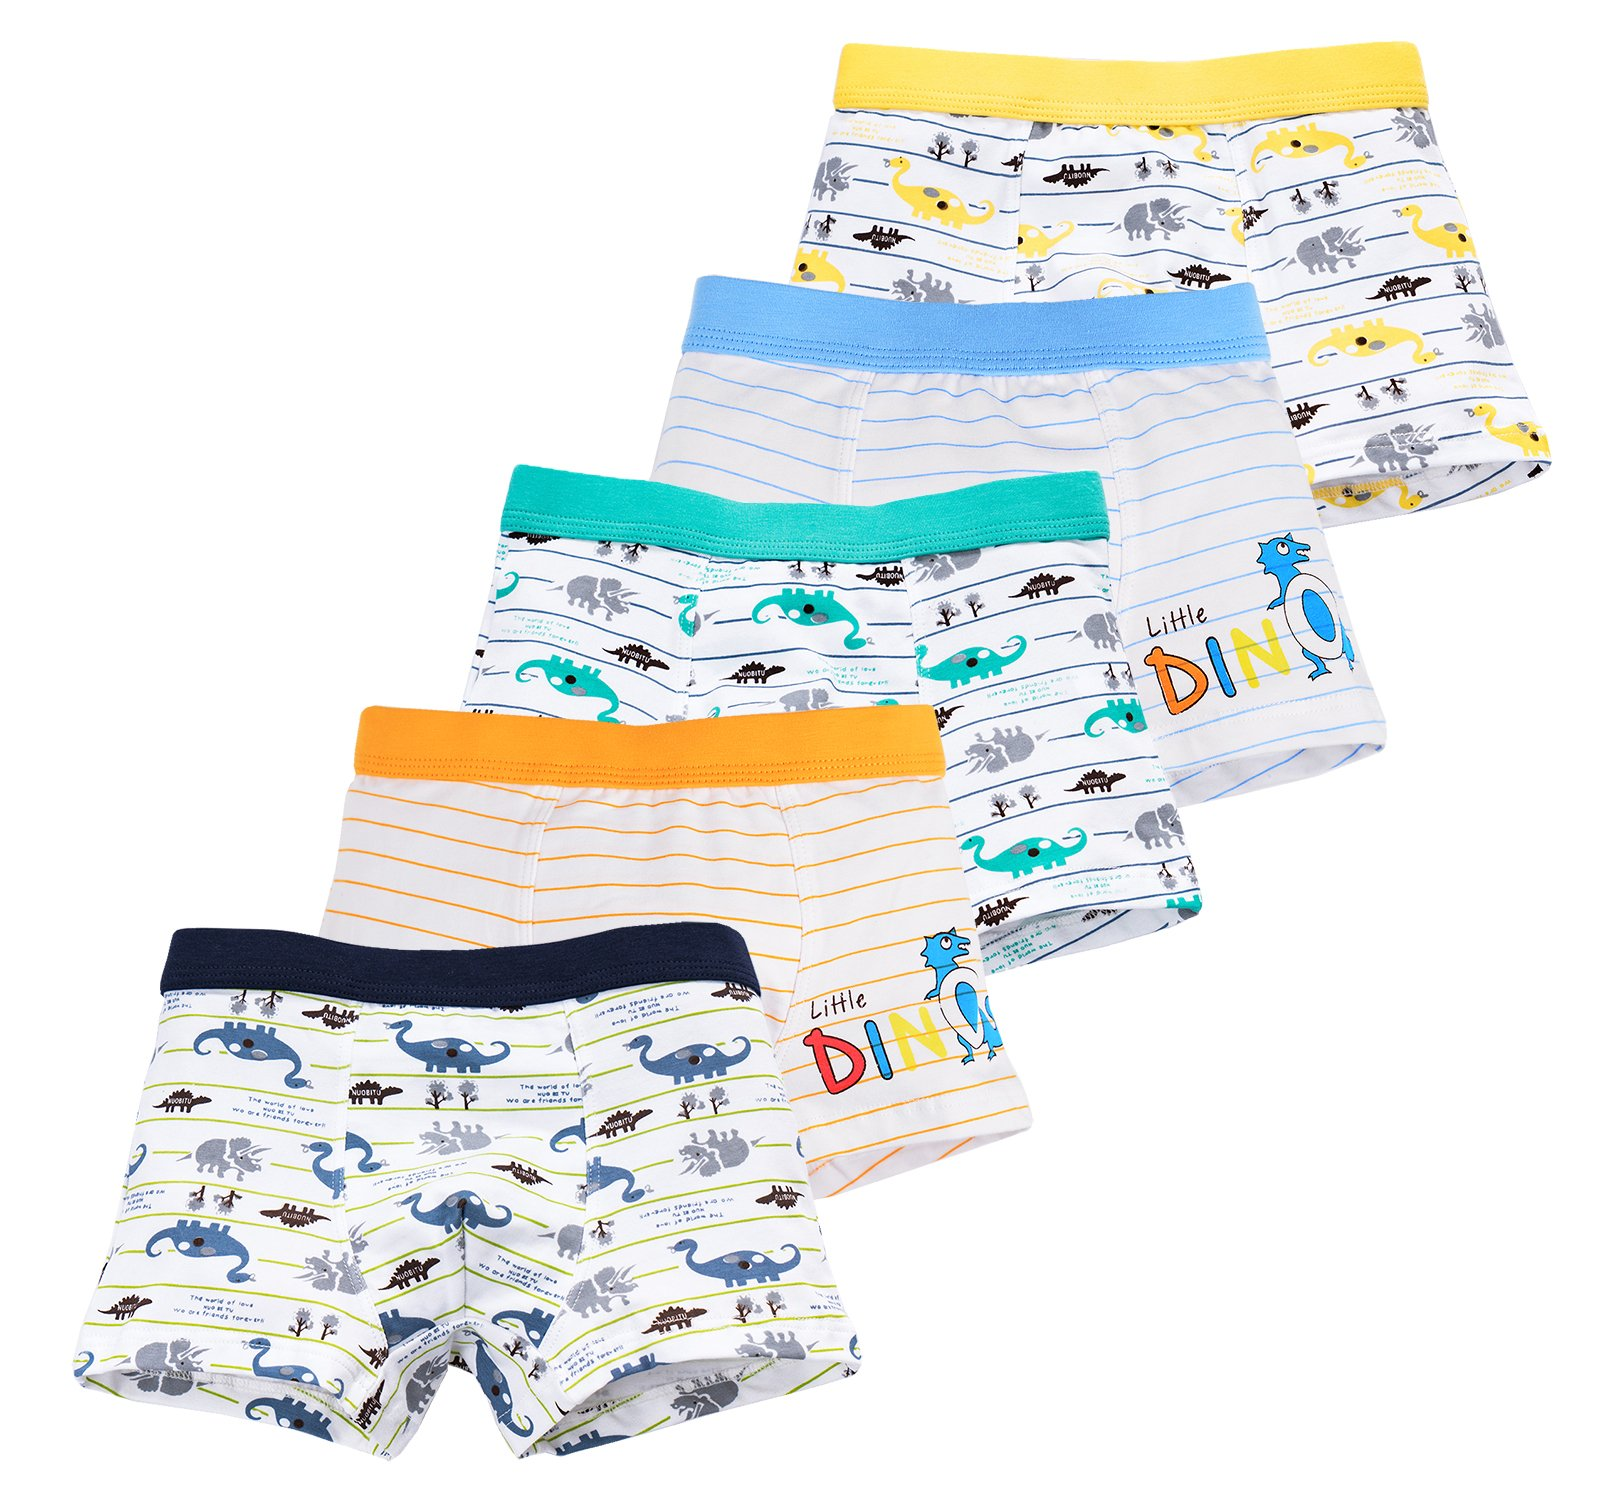 CHUNG Little Big Boys Soft Cotton Modal Boxer Briefs Underwear 5 Pack White Dinosaur, 3full-2stripe, 4T